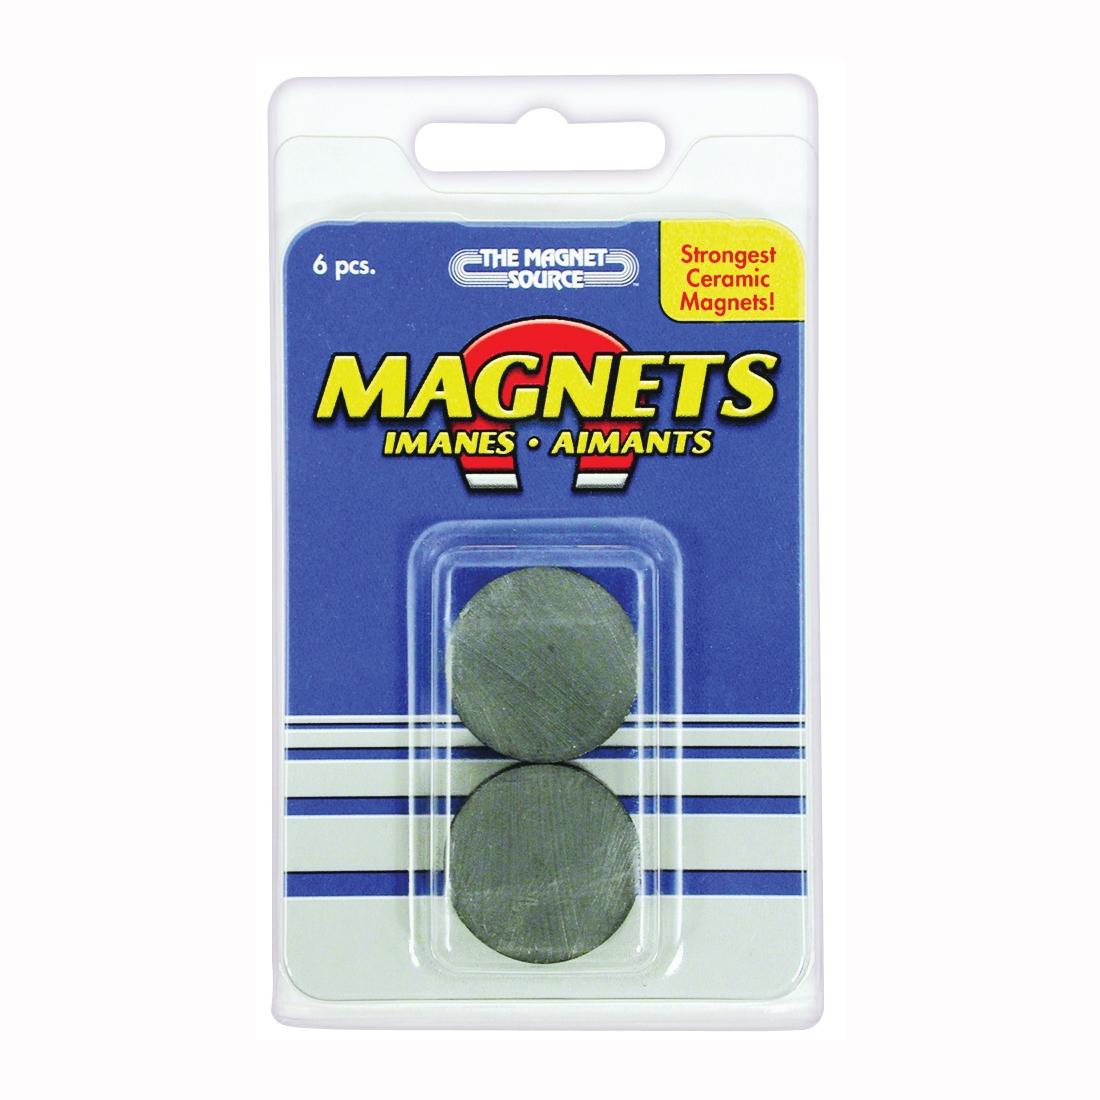 Magnet Source 07004